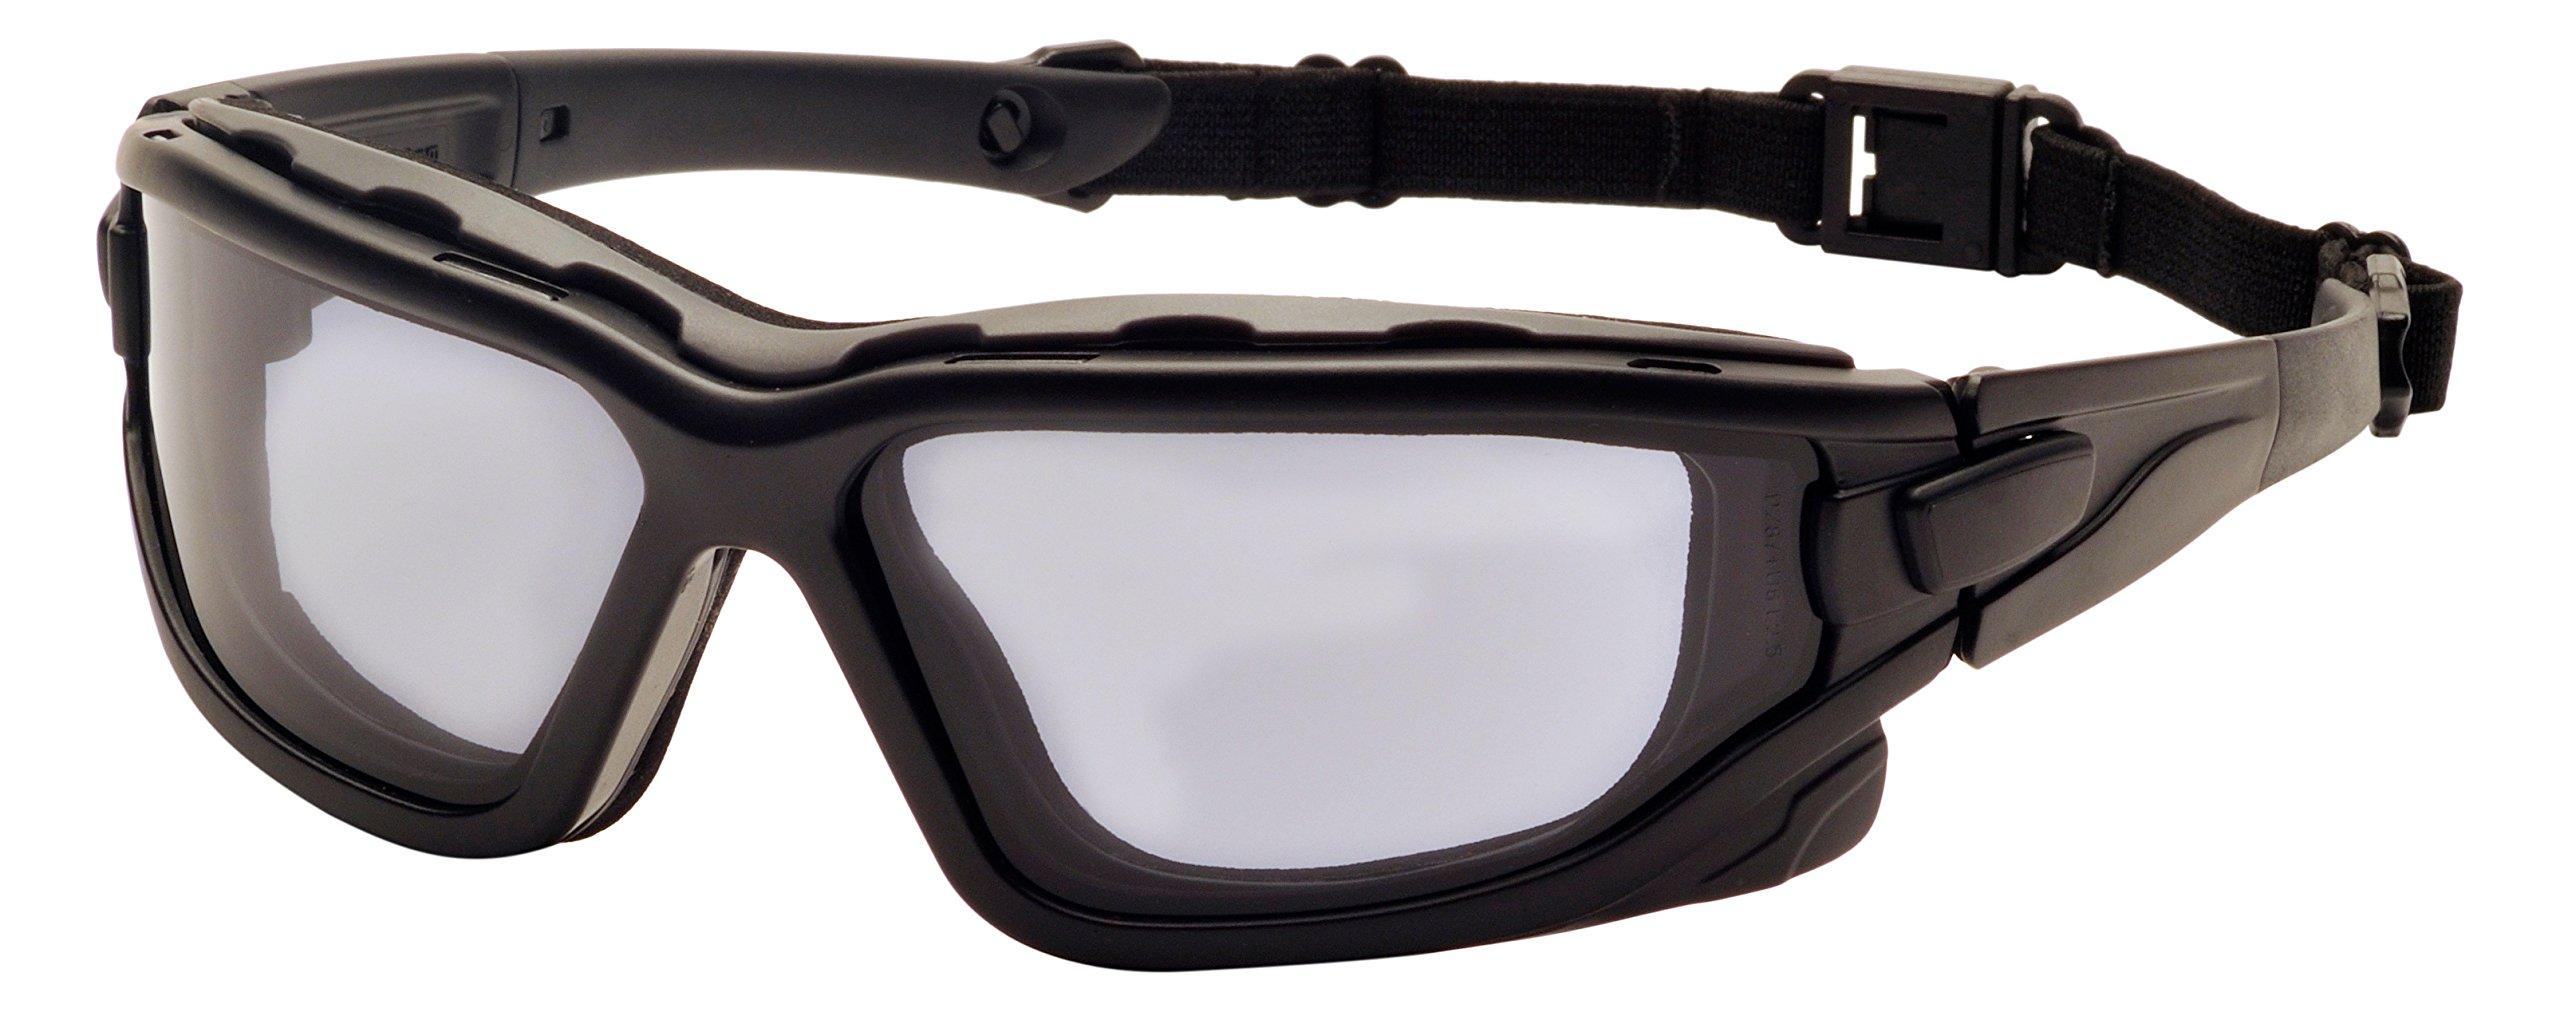 Pyramex I-Force Sporty Dual Pane  Anti-Fog Goggle,Black Frame/Gray Anti-Fog Lens